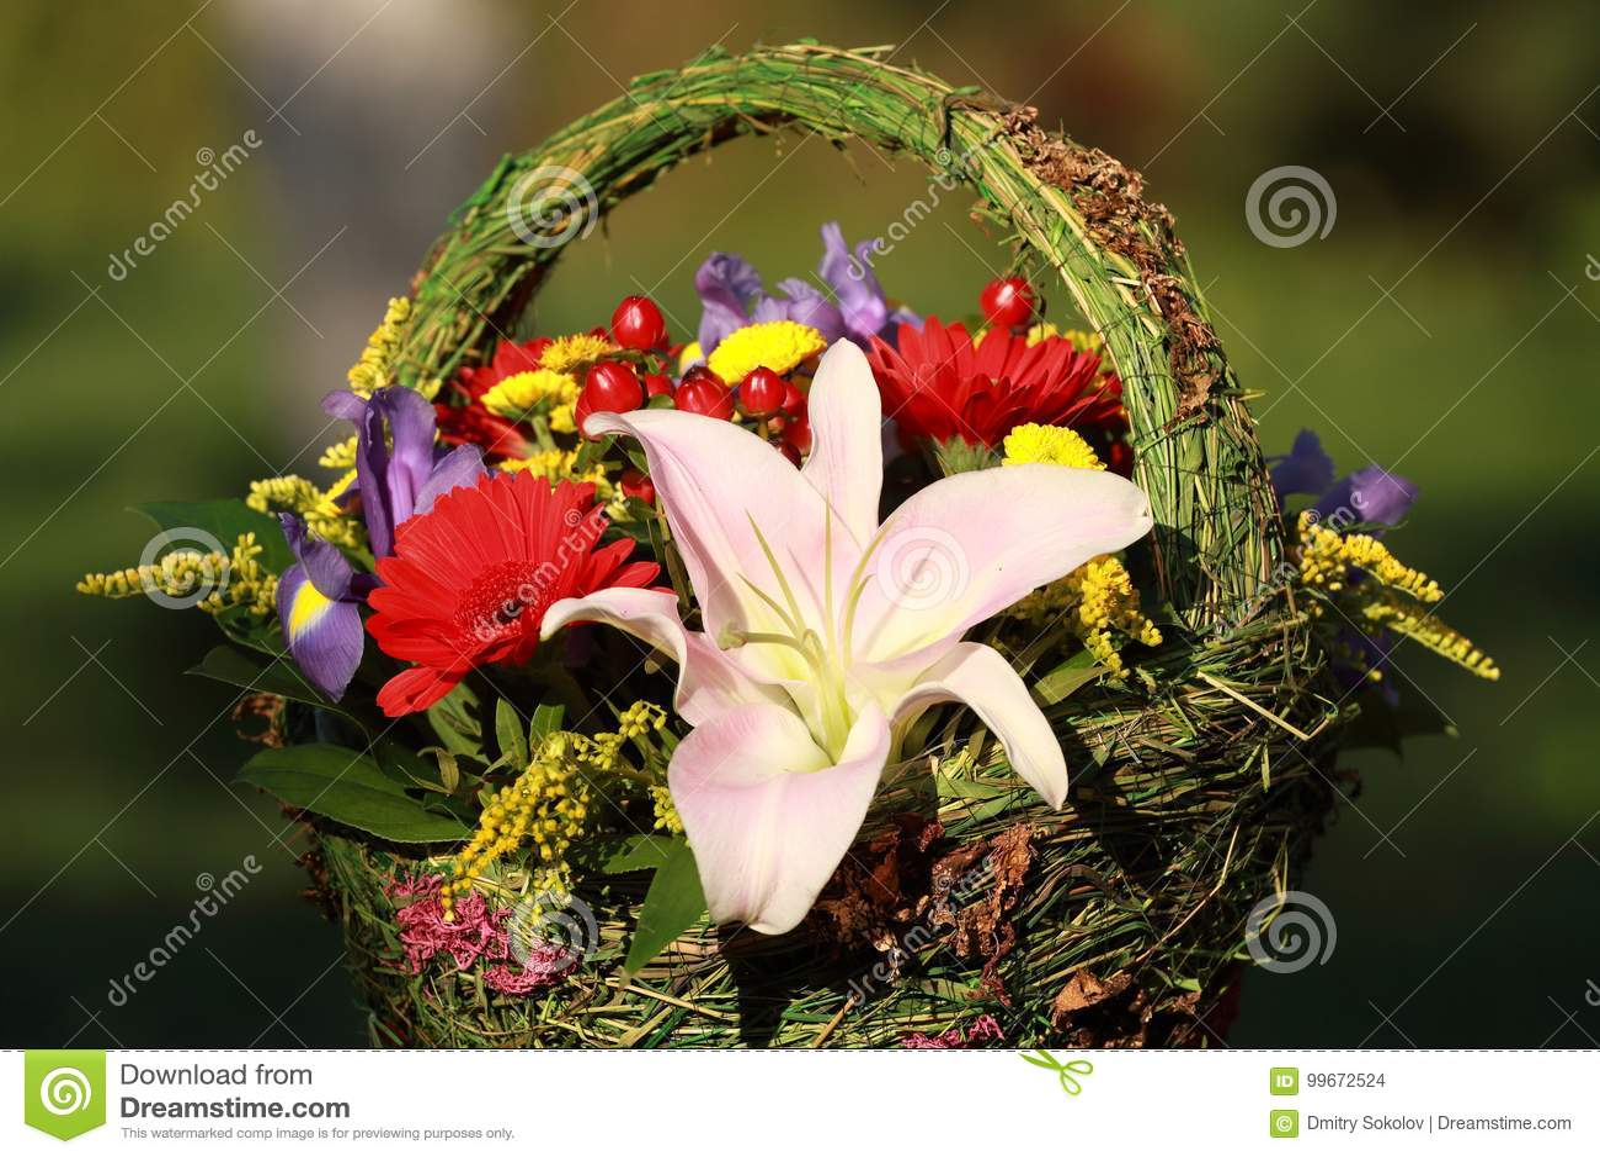 Beautiful bouquet of flowers for women stock photo image of women the most beautiful bouquet of flowers for women izmirmasajfo